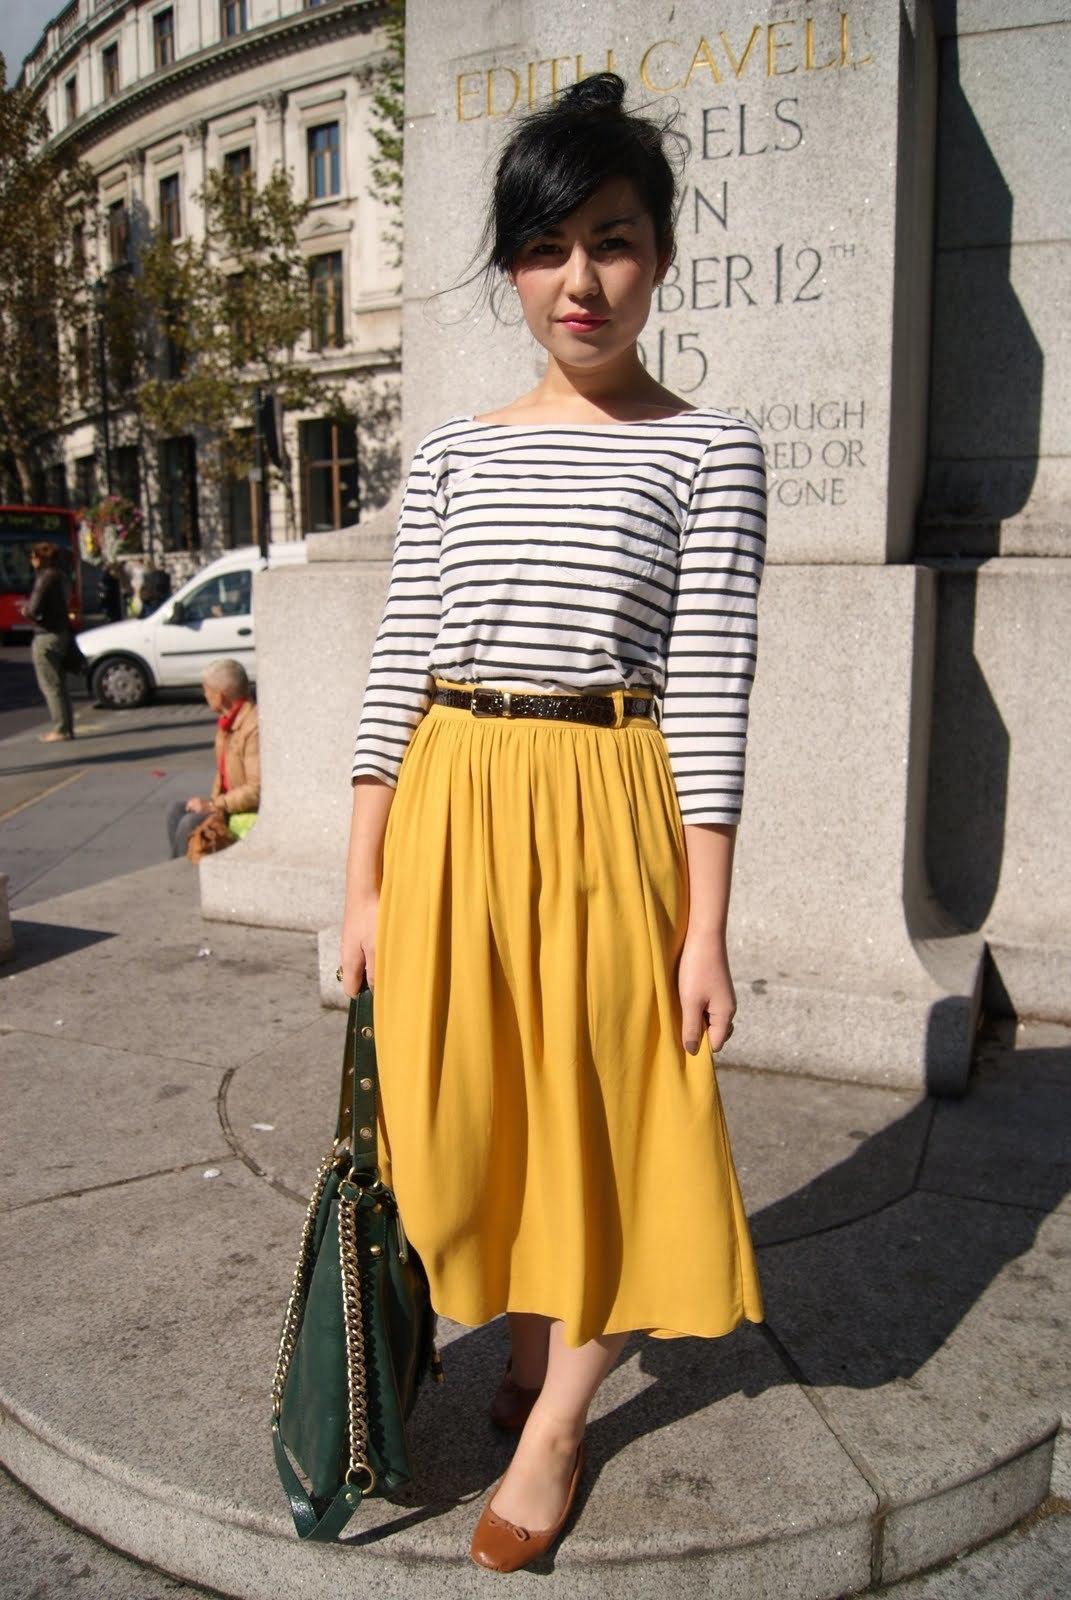 Women's White and Black Horizontal Striped Long Sleeve T-shirt ...